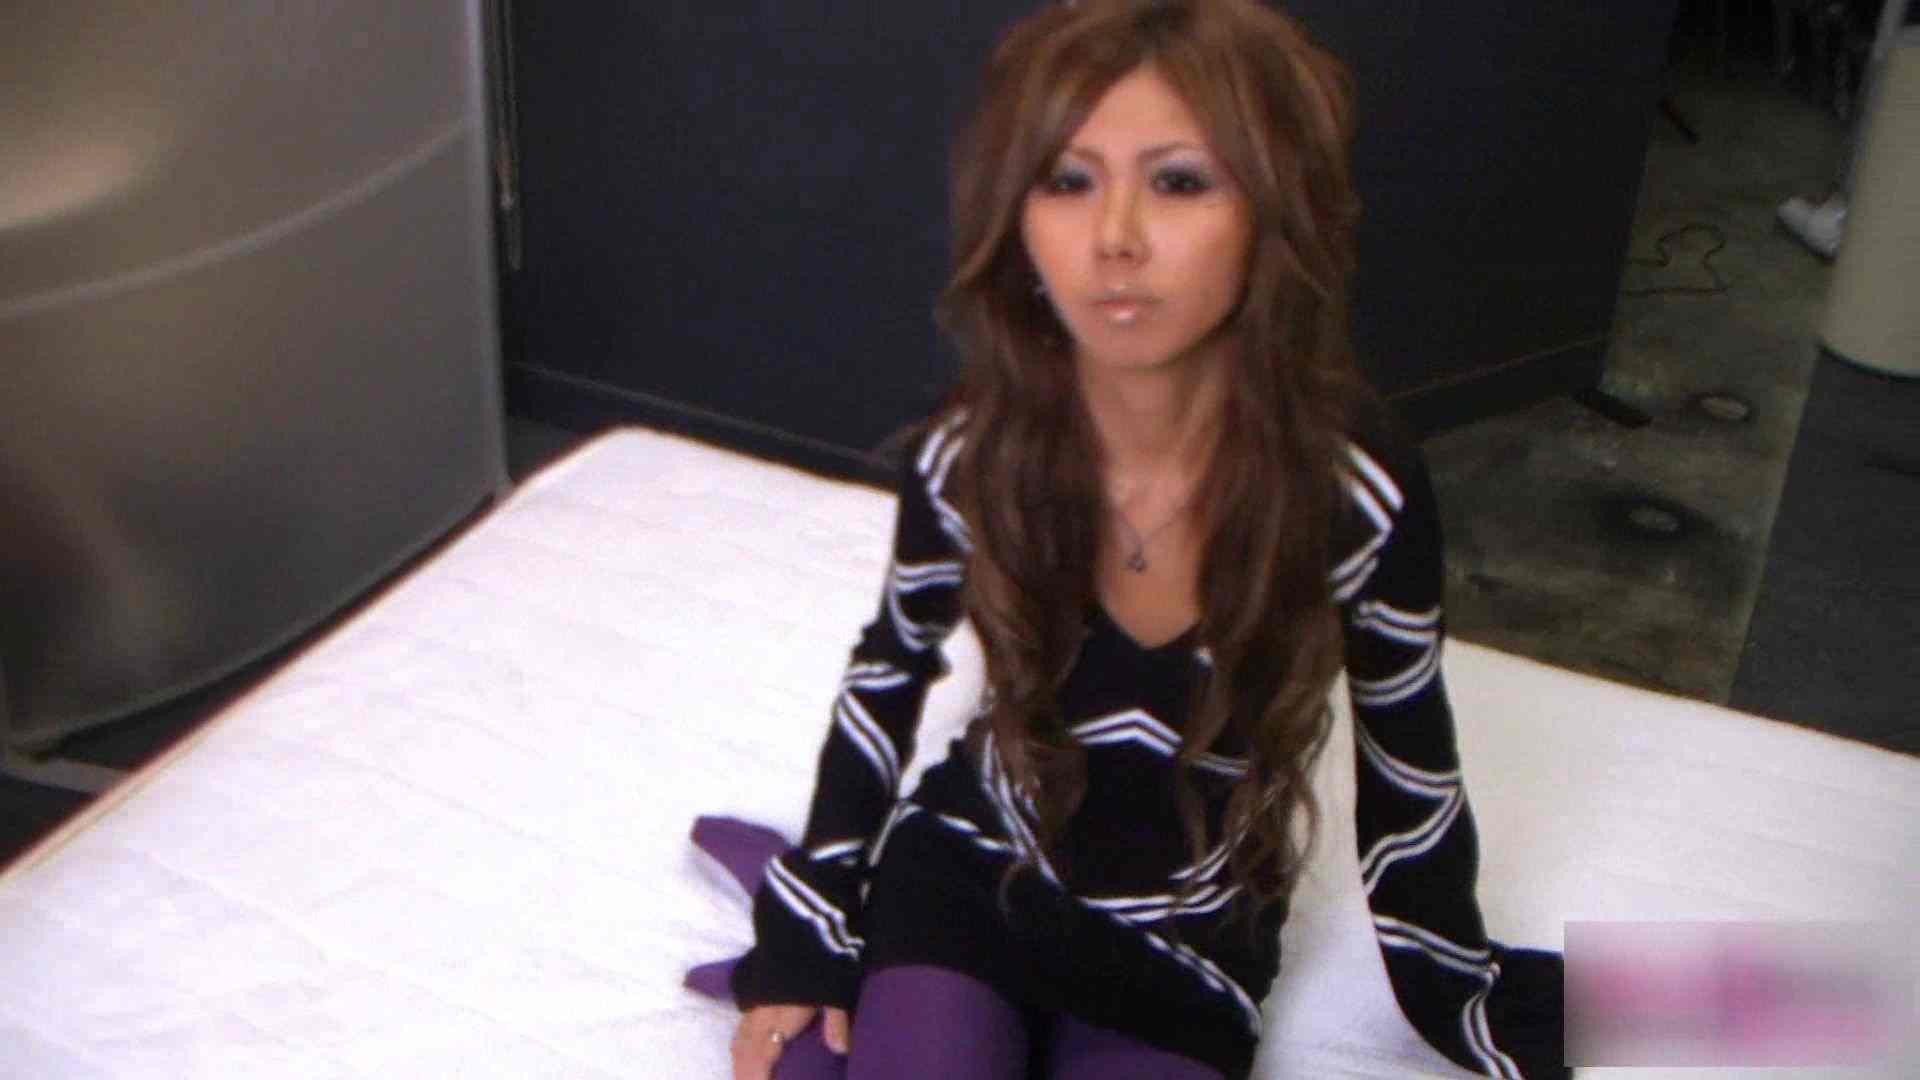 S級厳選美女ビッチガールVol.18 美女ヌード | OLセックス  78画像 22